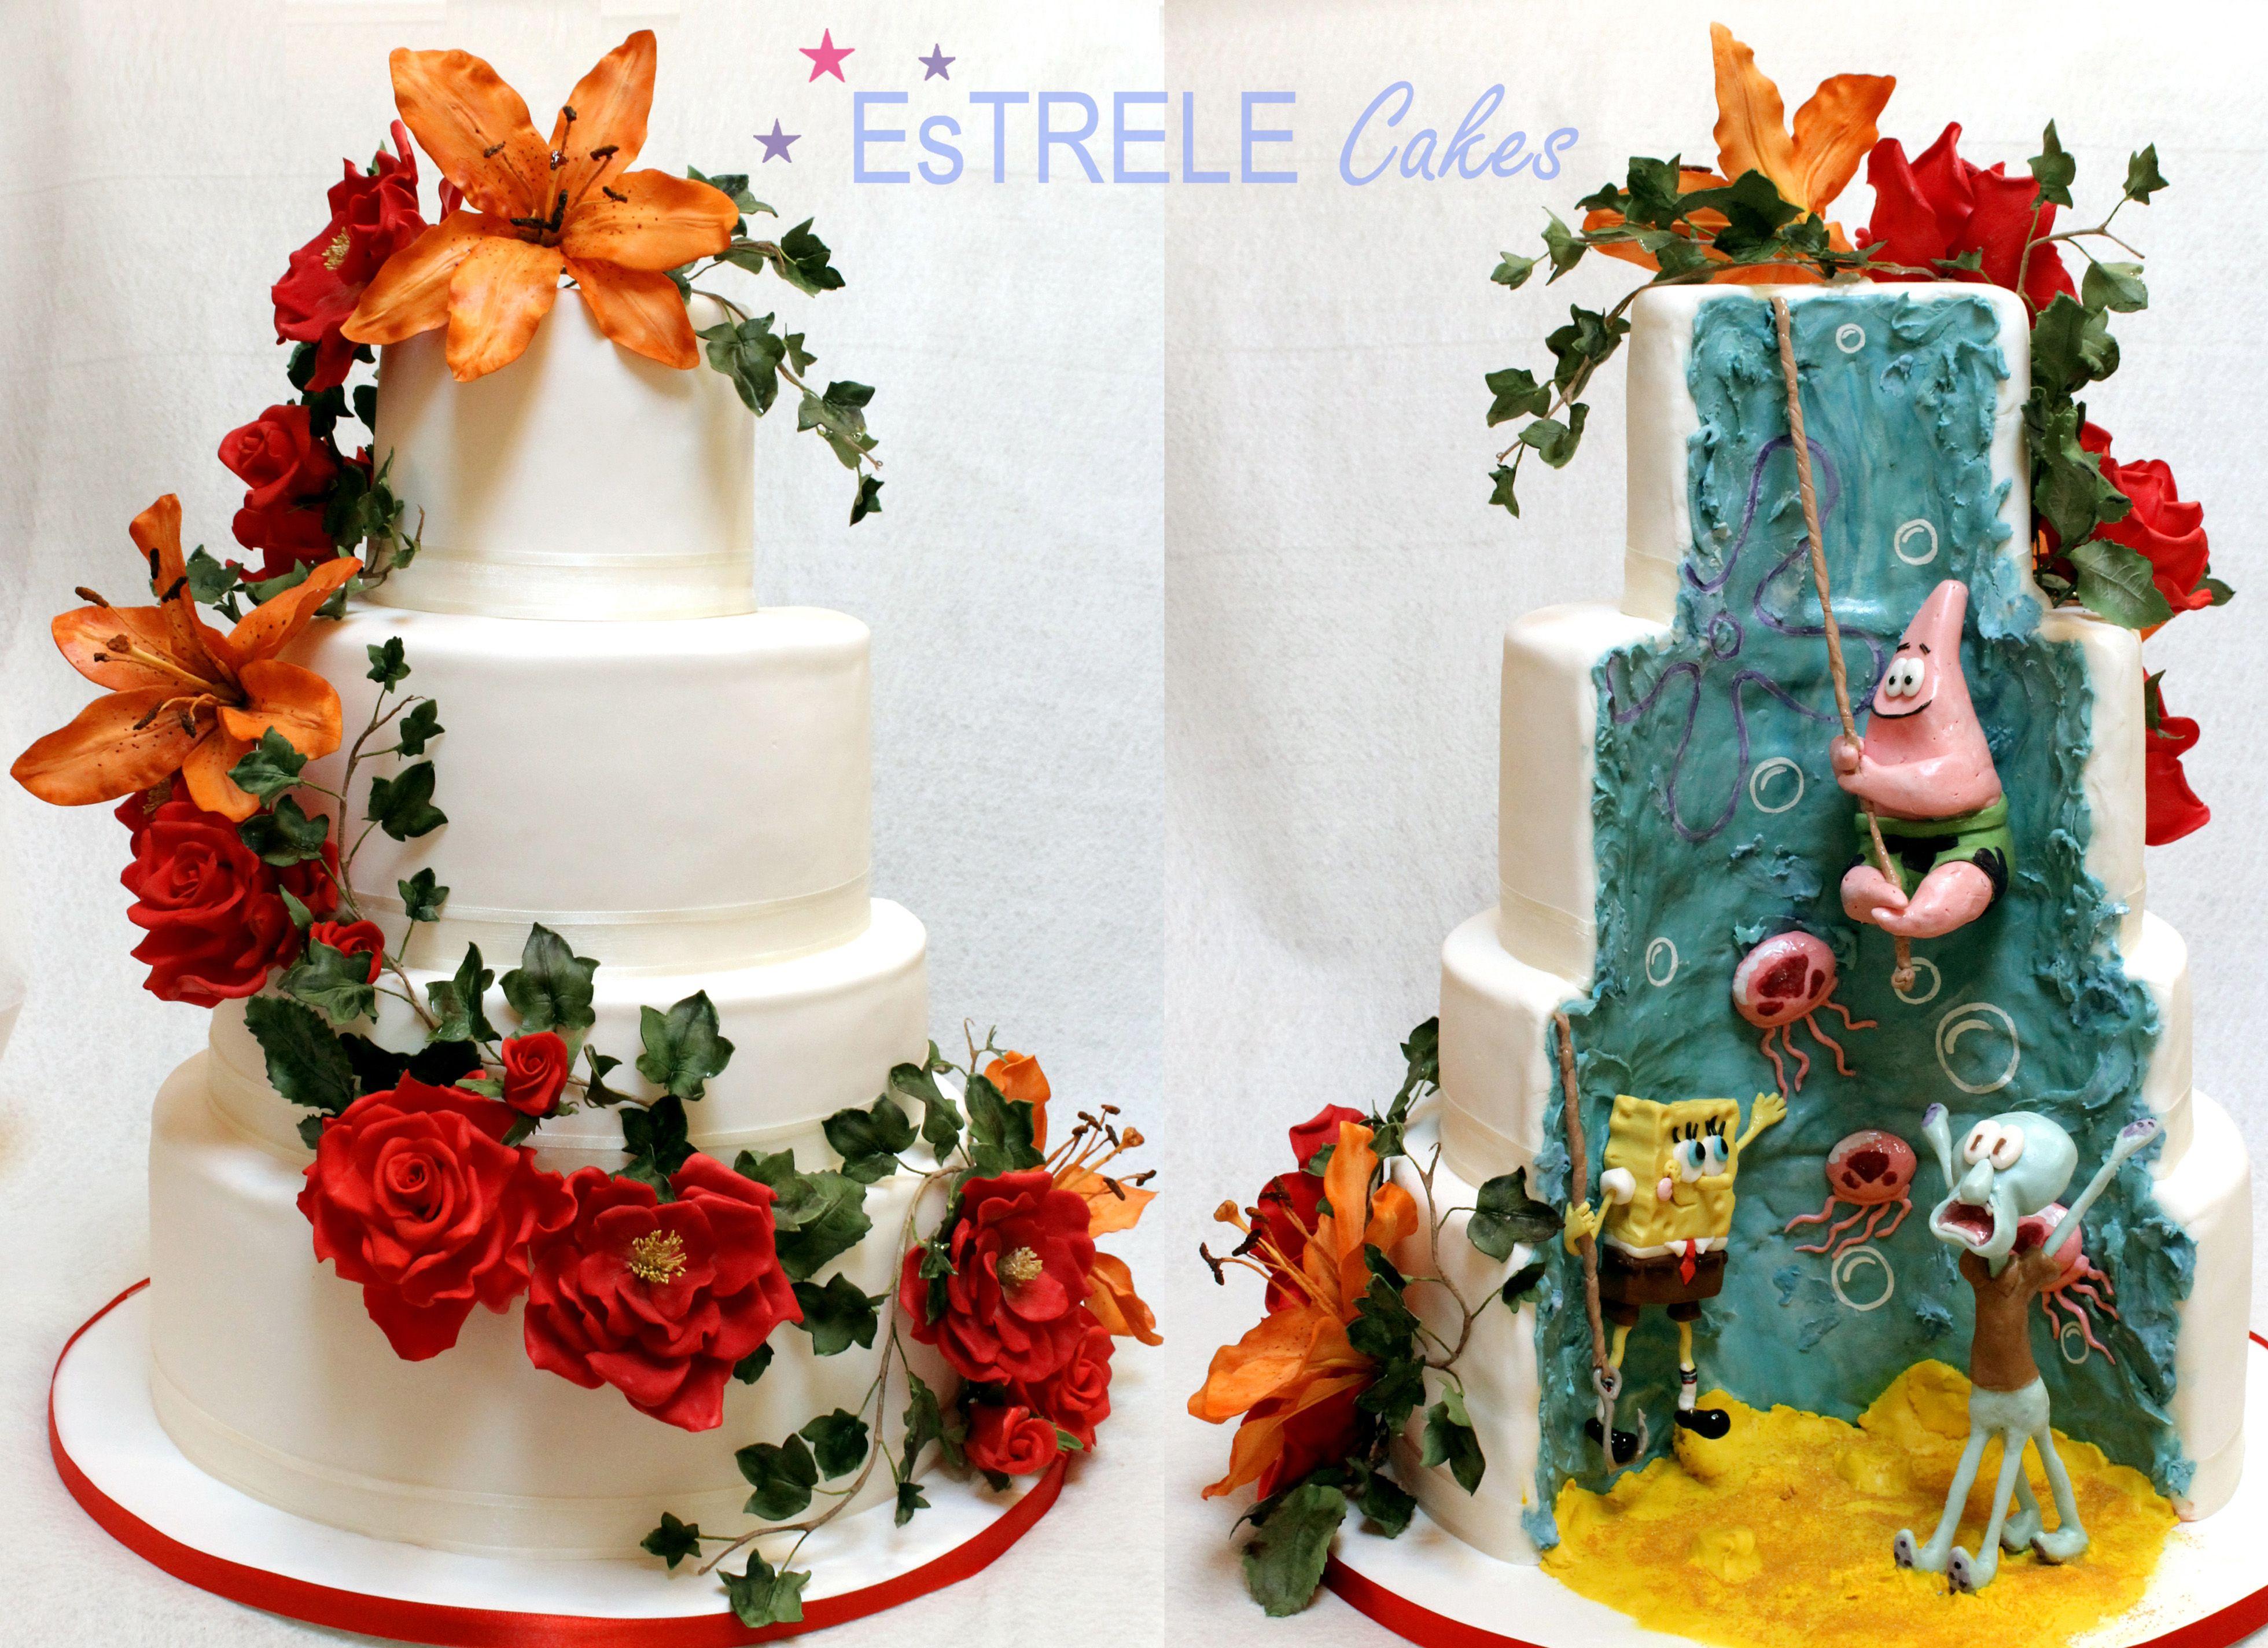 Spongebob wedding cake   My epic wedding   Pinterest   Wedding cake ...